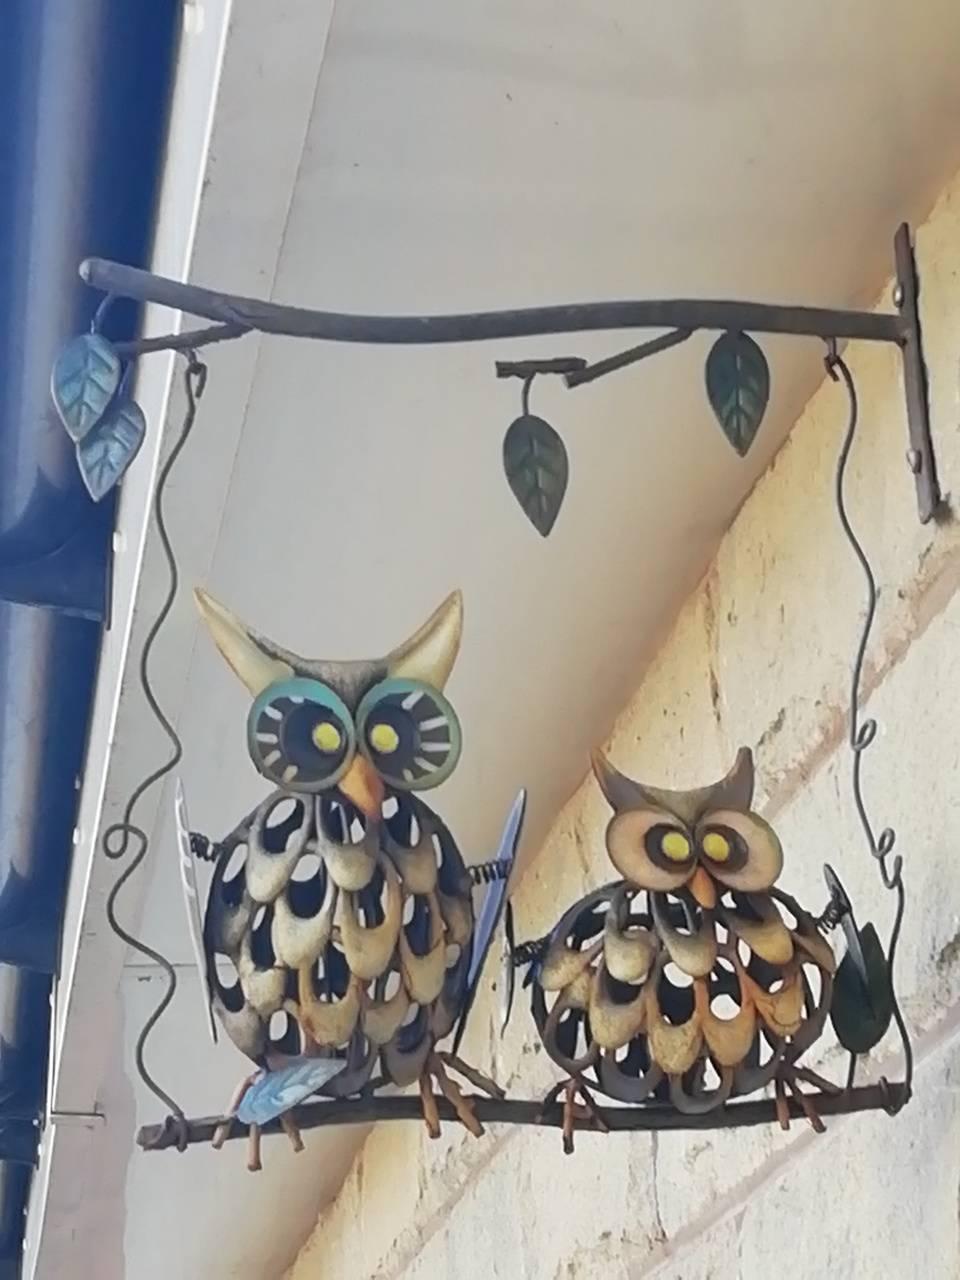 Owls chillin